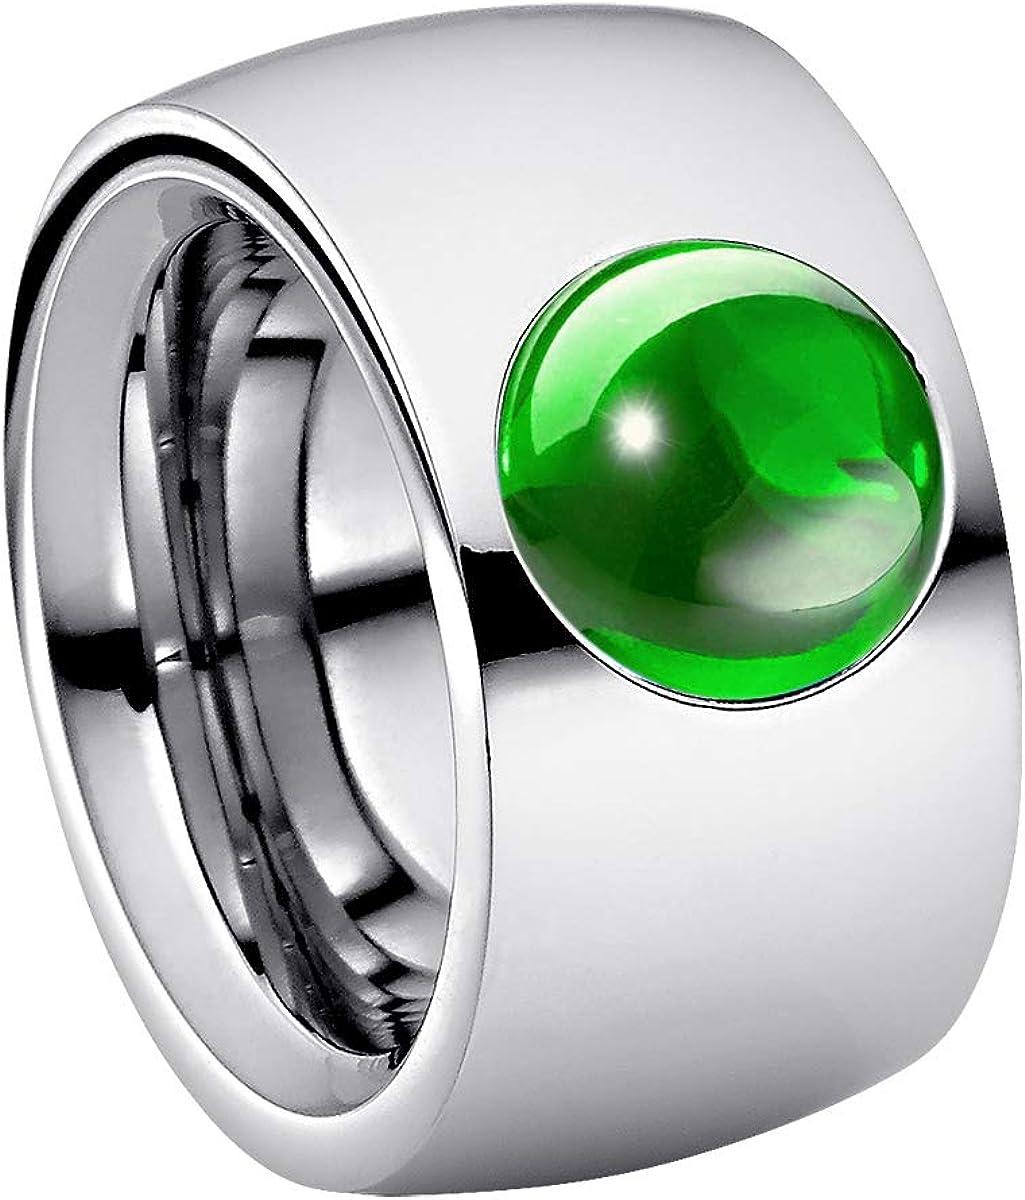 Heideman Ring Ladies Coma14 Cabo Acero Inoxidable Color Plata Mate Anillo para Mujeres con cabujón Color Verde Menta